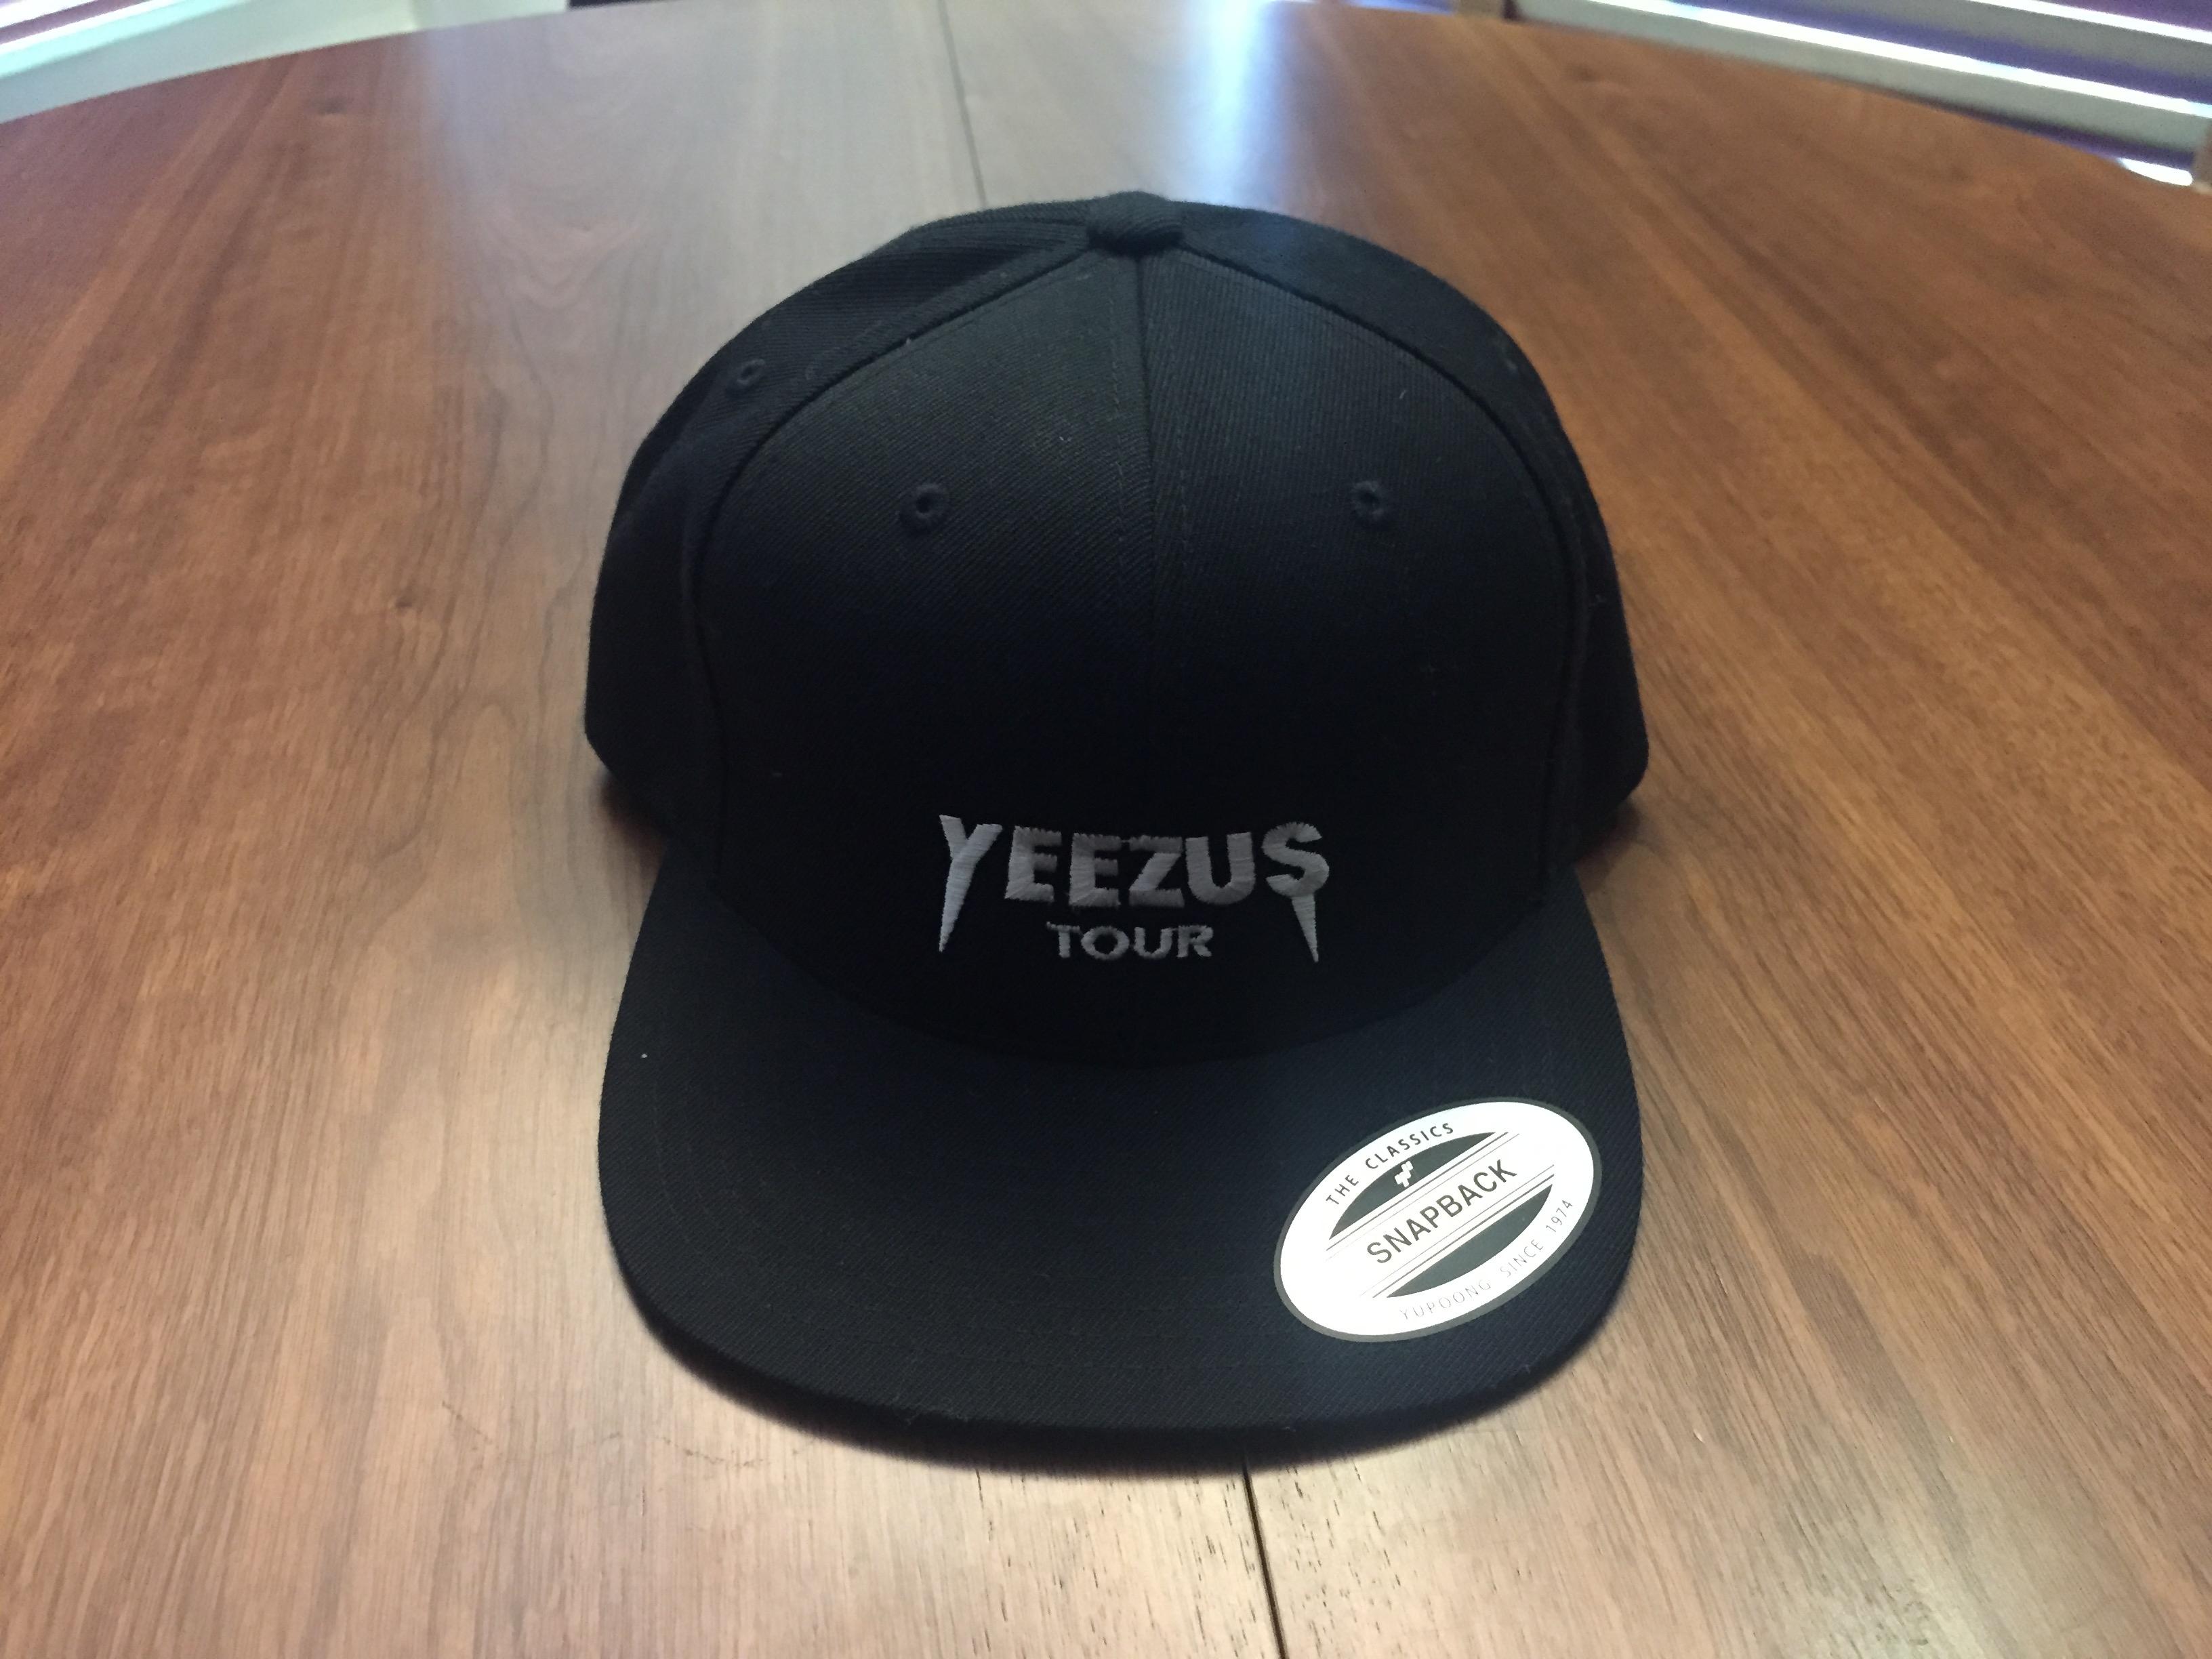 d66e8c30 Kanye West Yeezus Tour Snapback Cap Black | Grailed